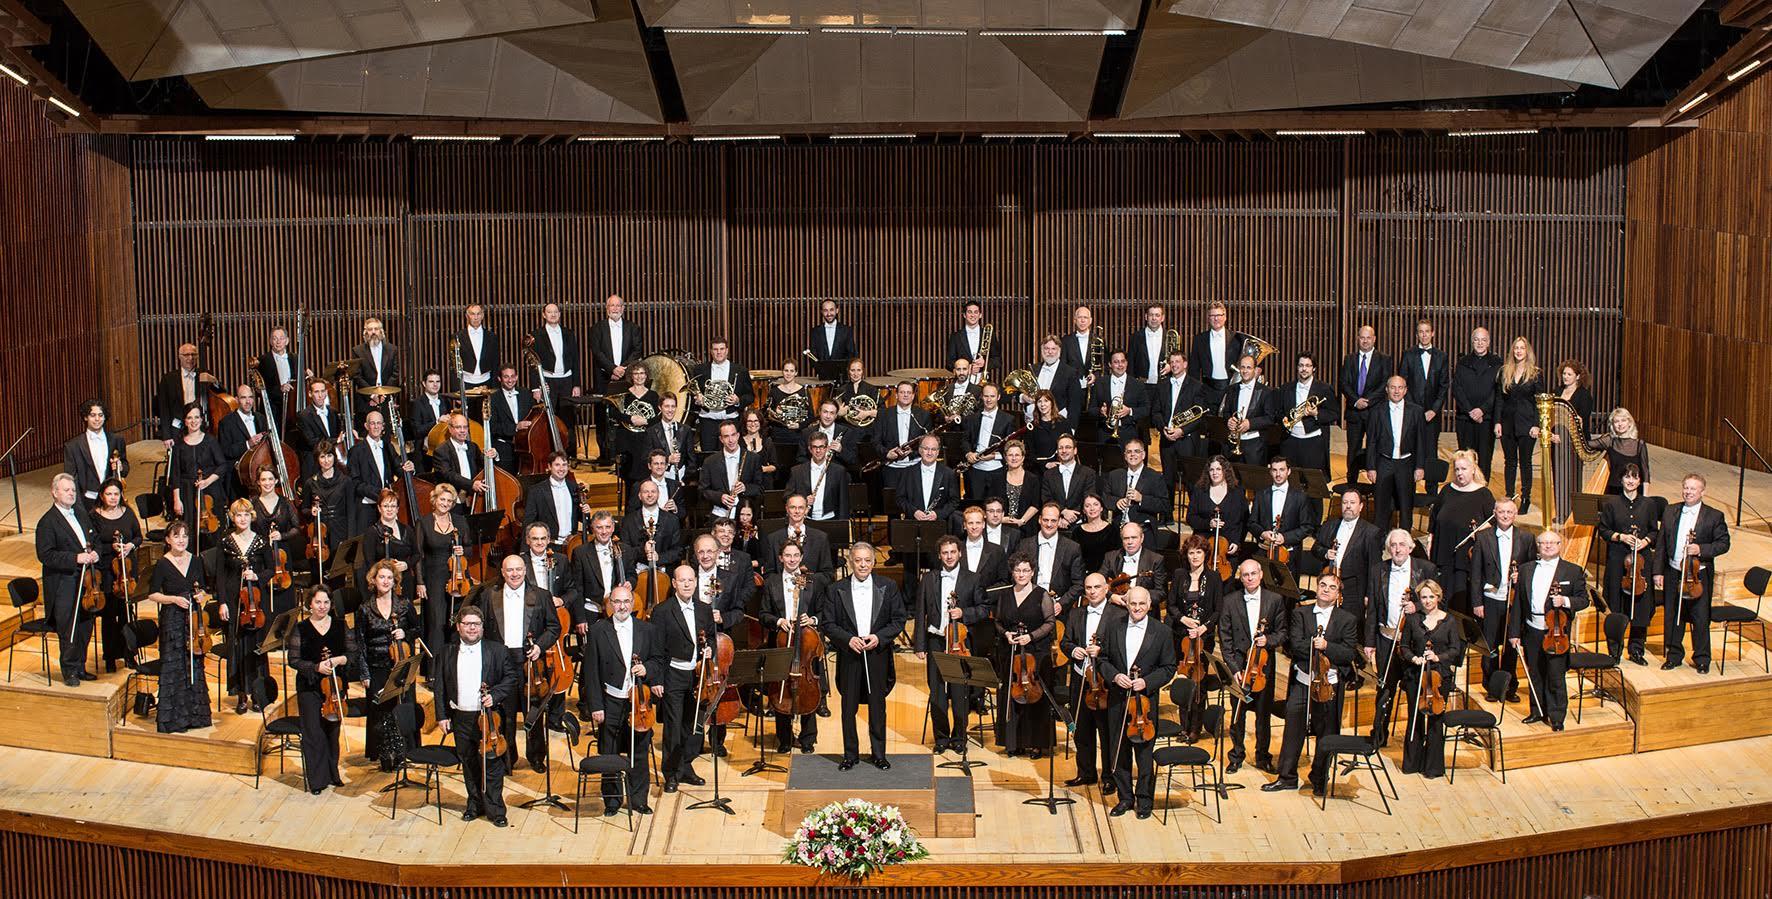 Orquesta Filarmónica de Israel